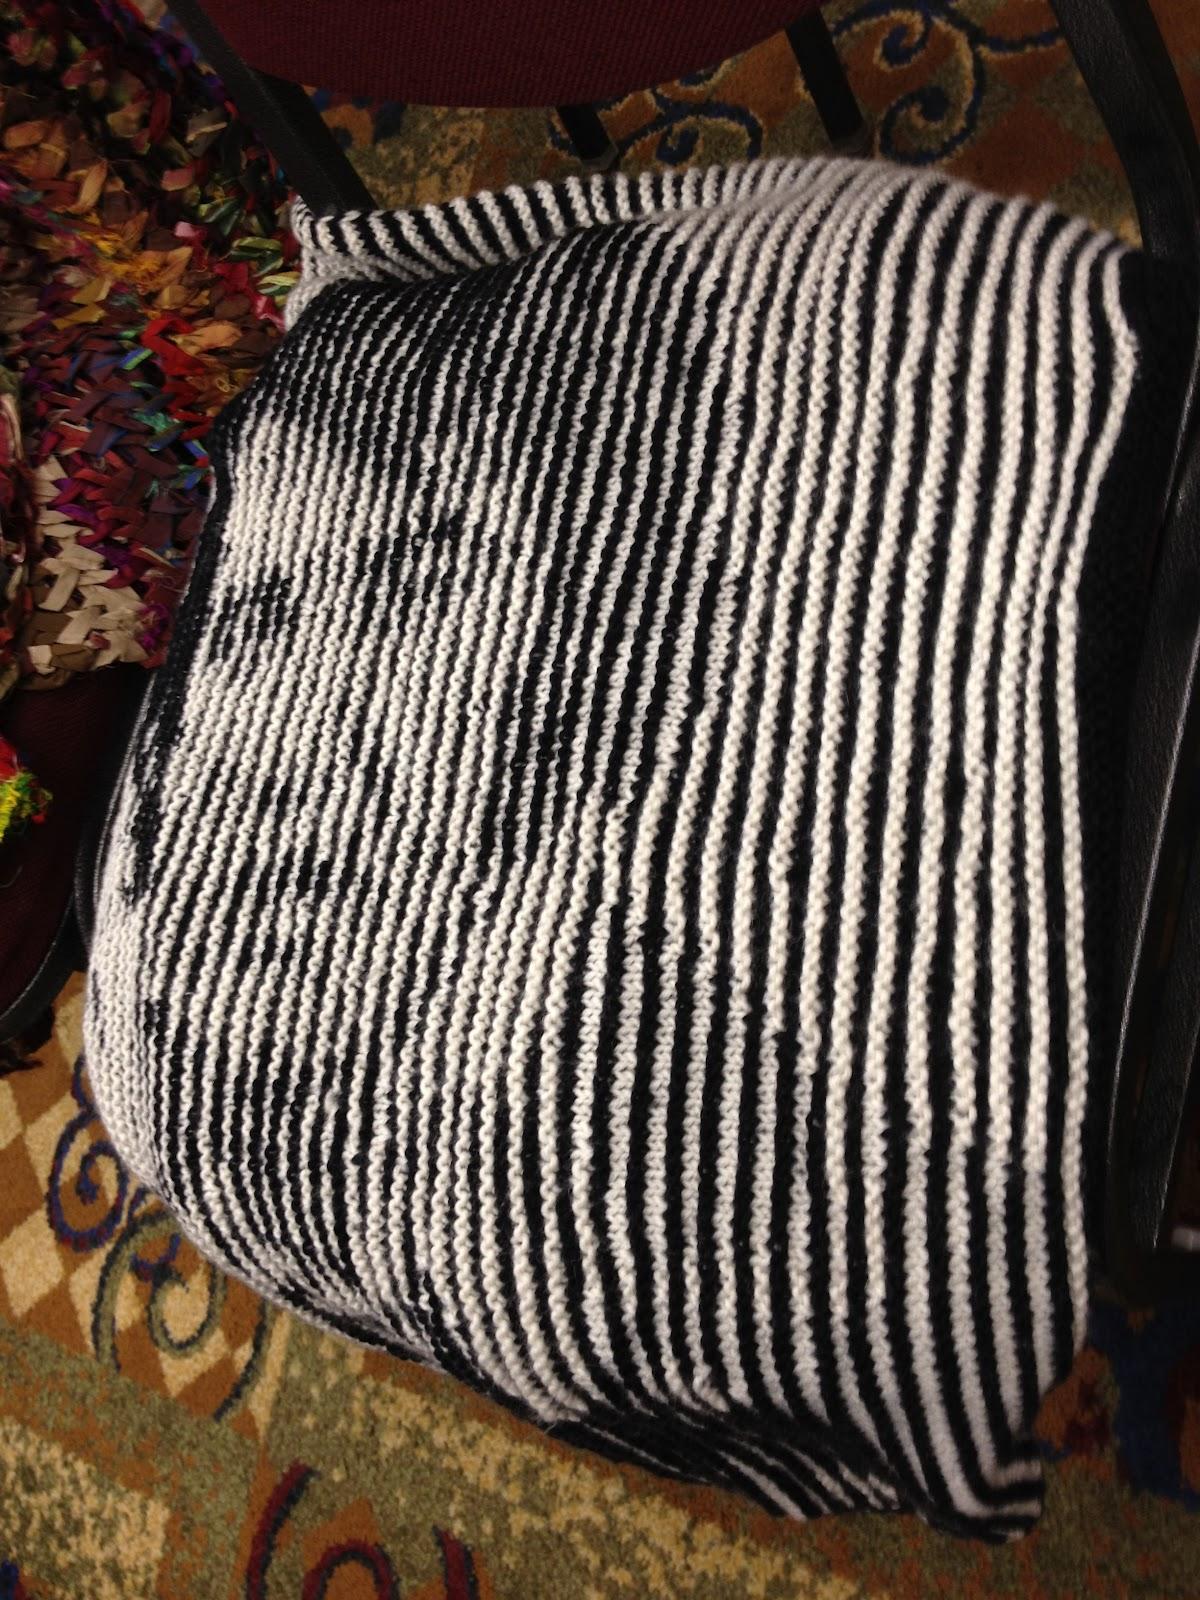 Knitting Pattern For Elvis Jumper : knitsarina: Knitting Camp 2012